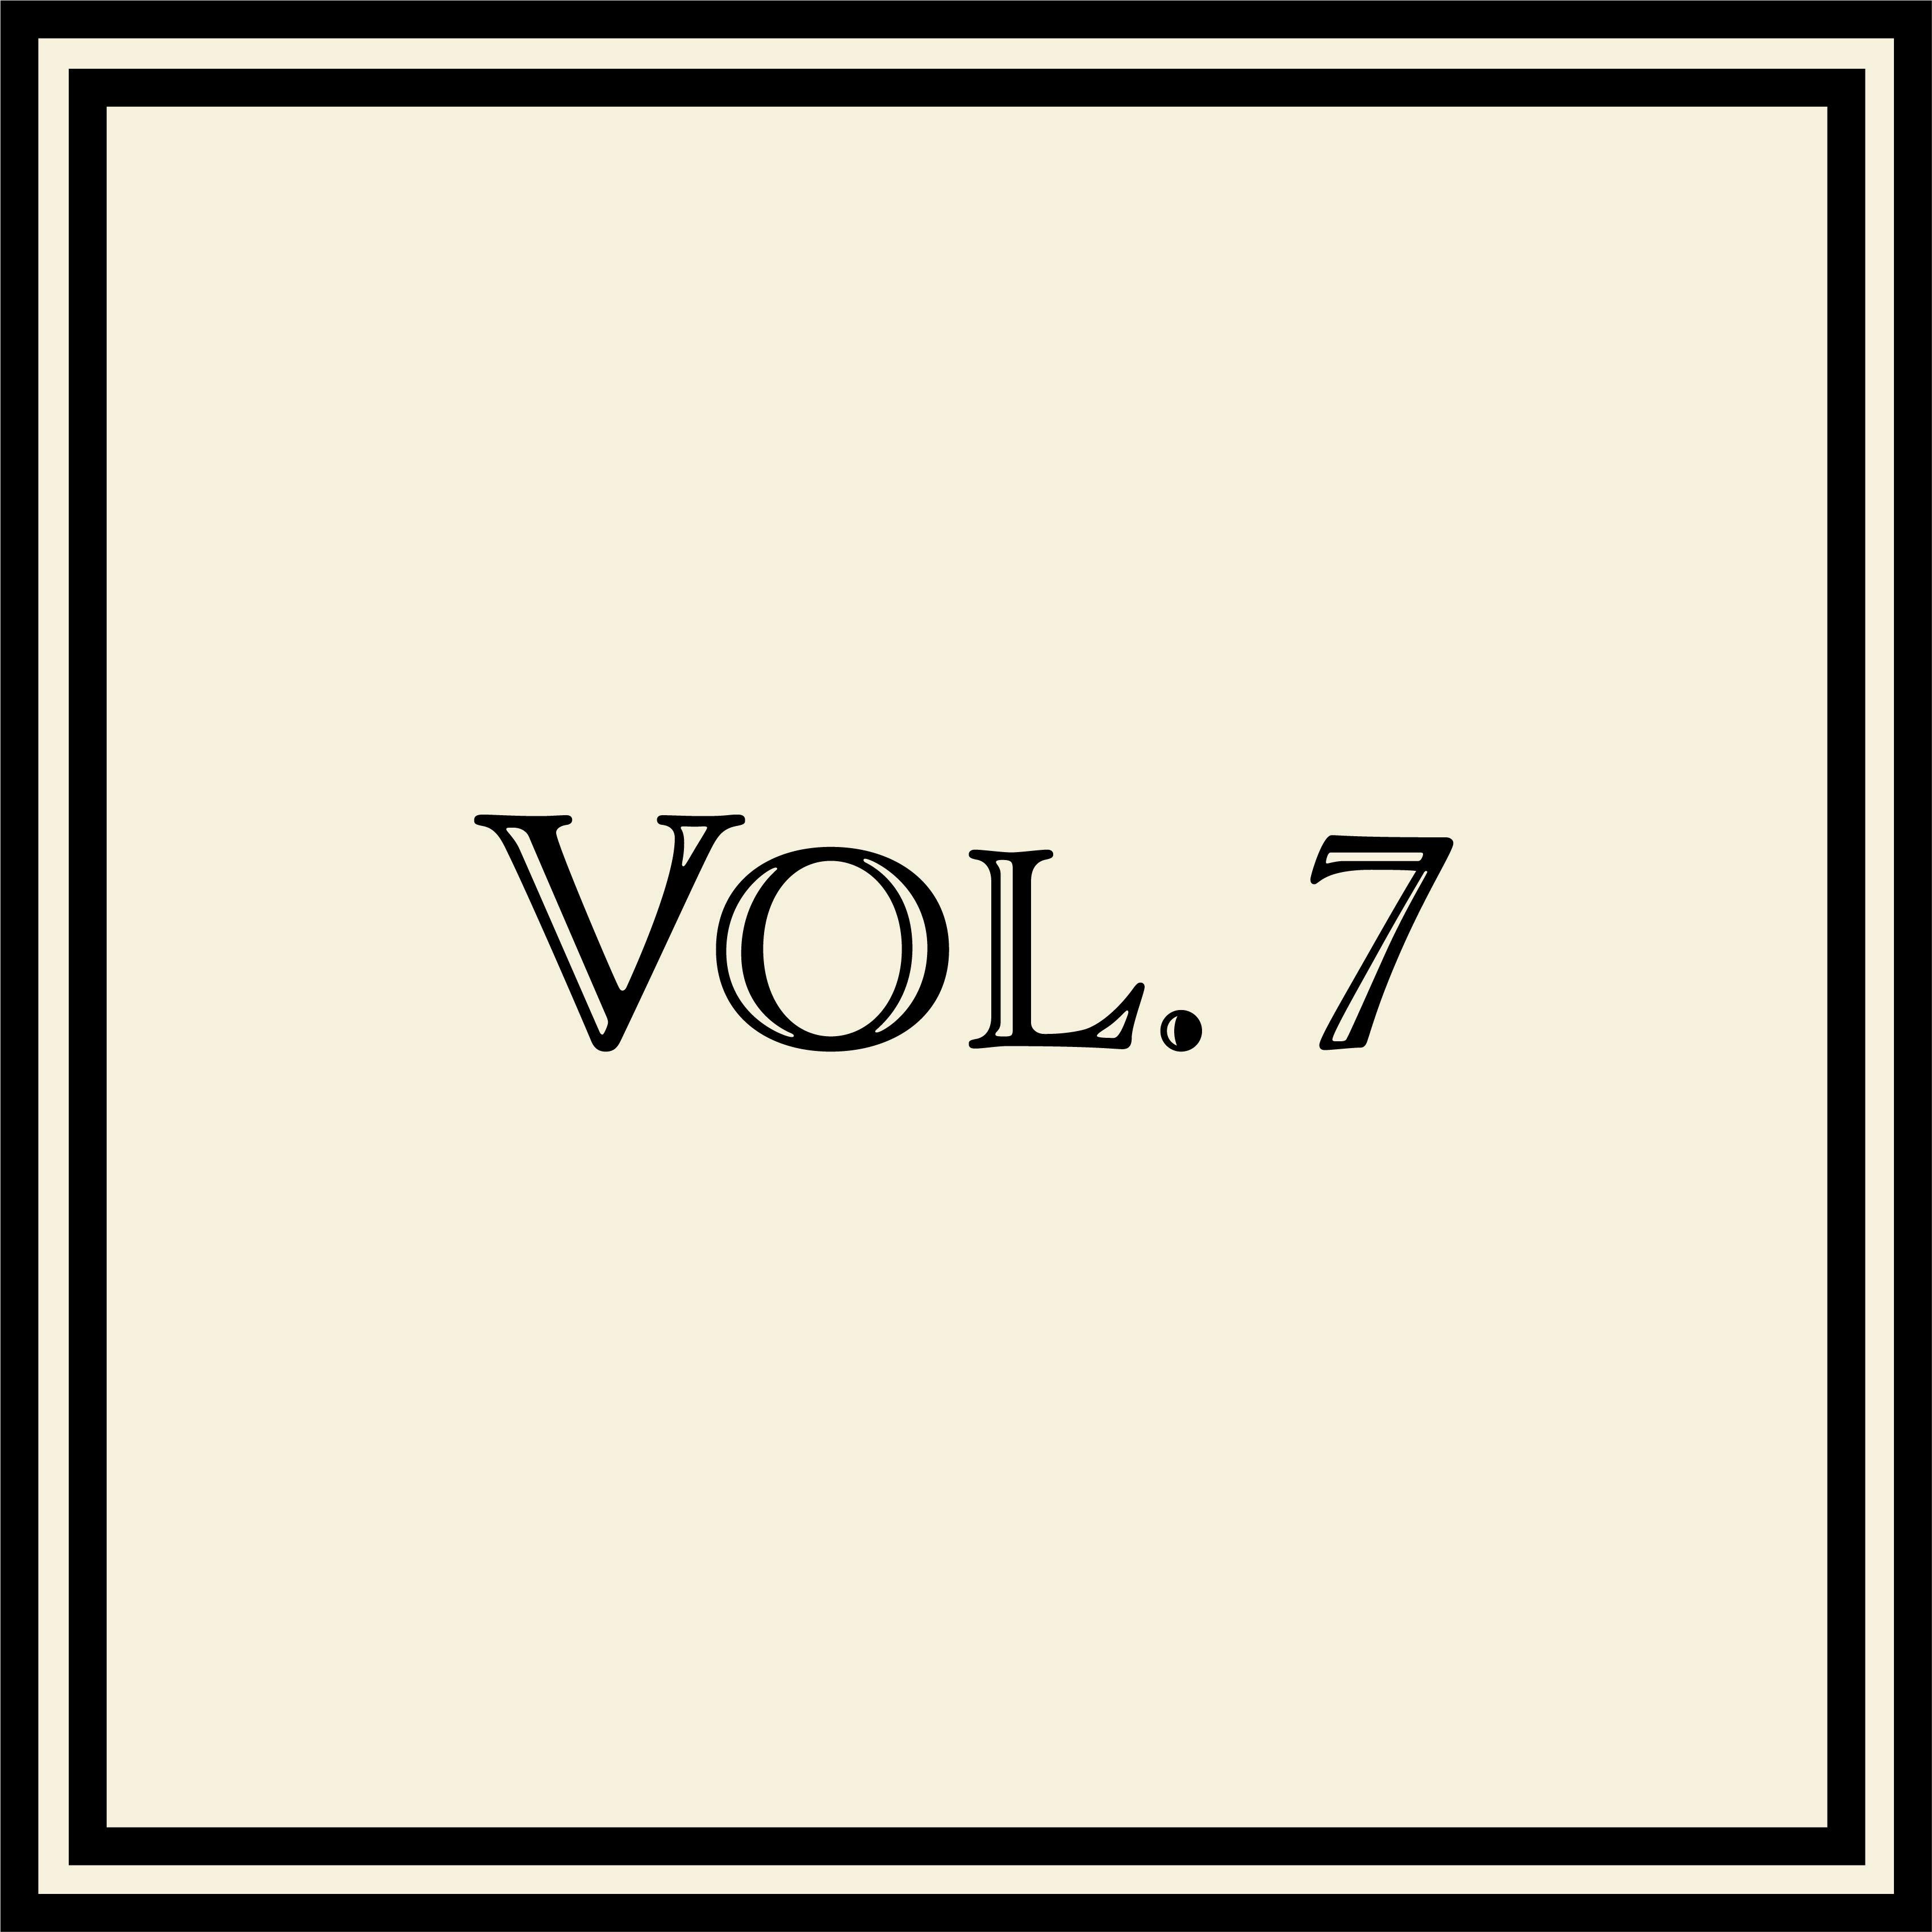 volume7